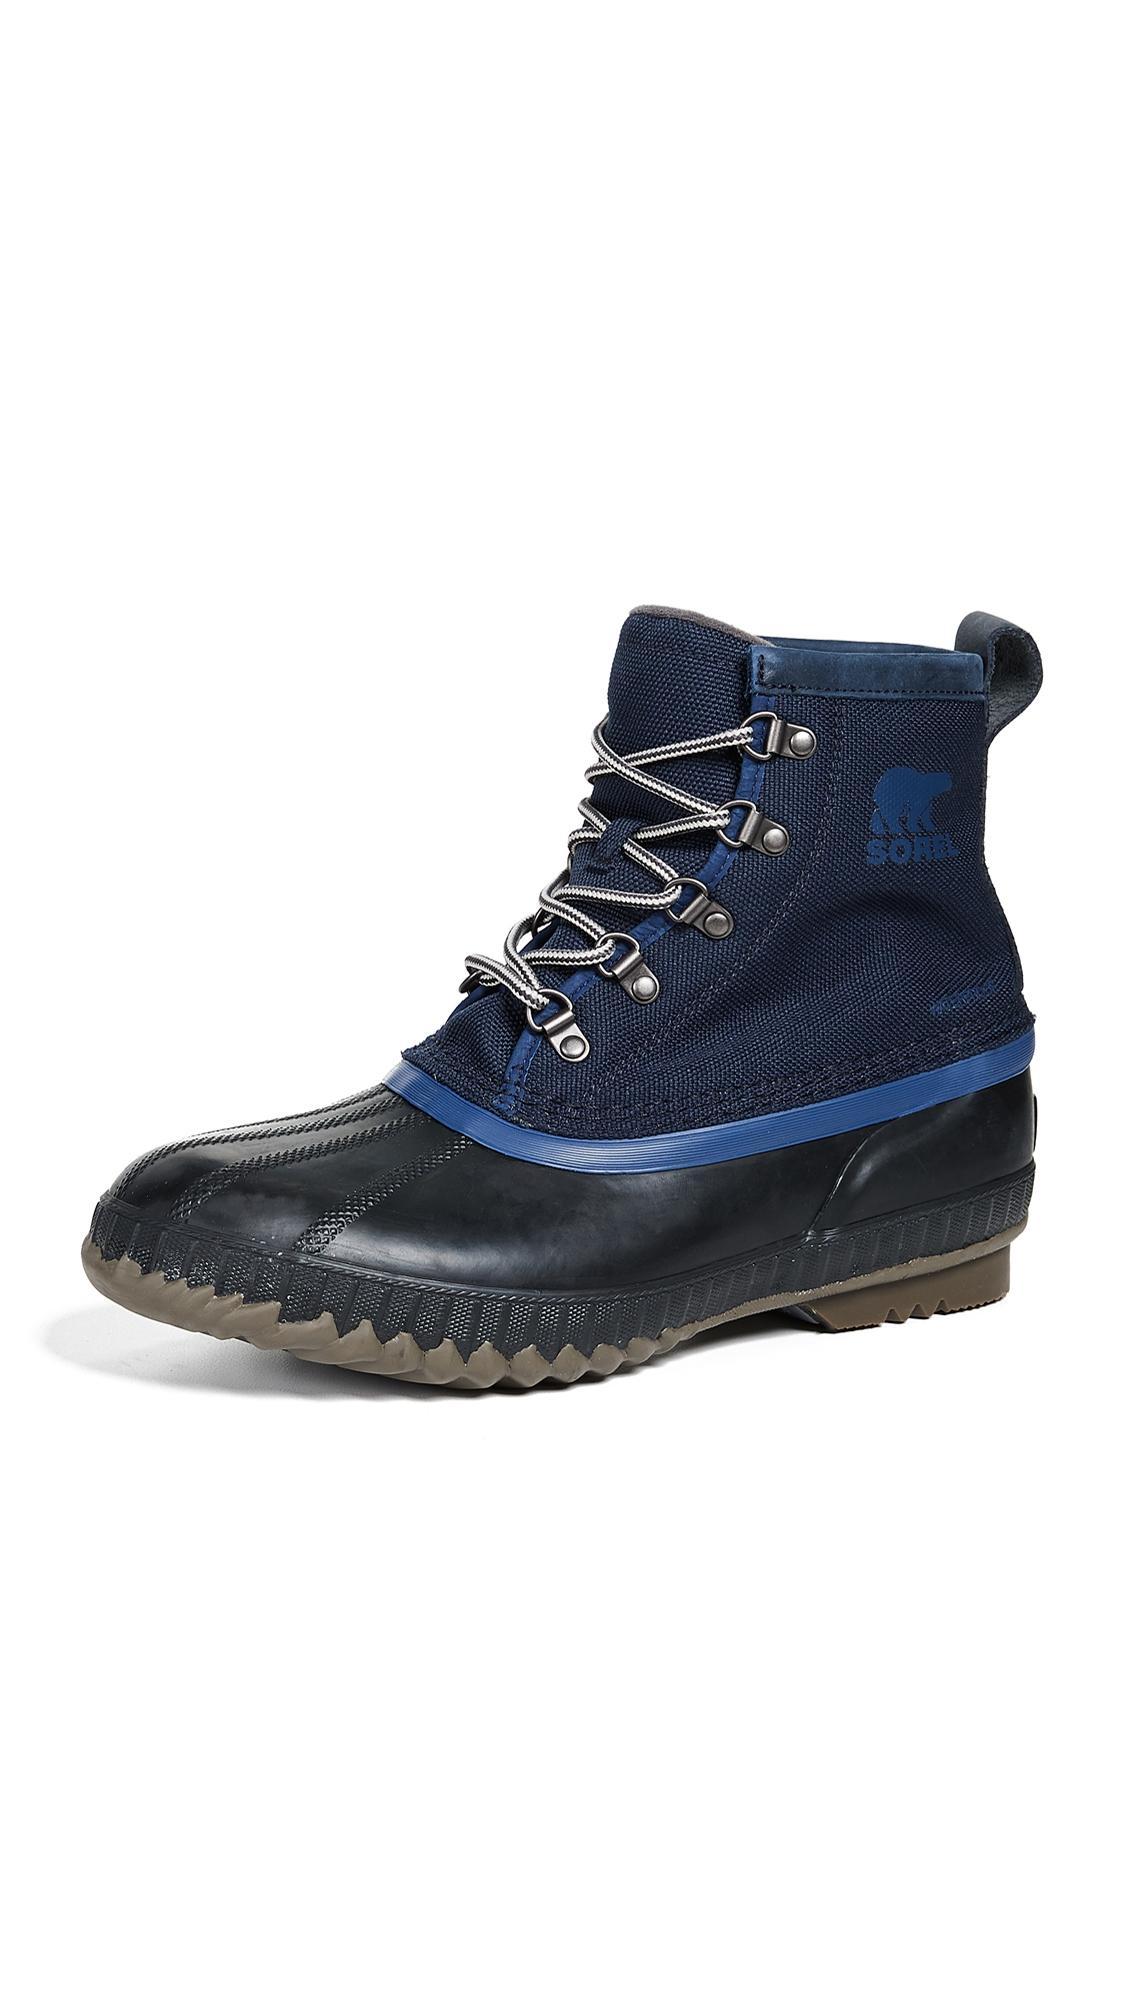 3c540e9299e Men's Cheyanne Ii Short Nylon Lace-Up Duck Boots in Collegiate Navy